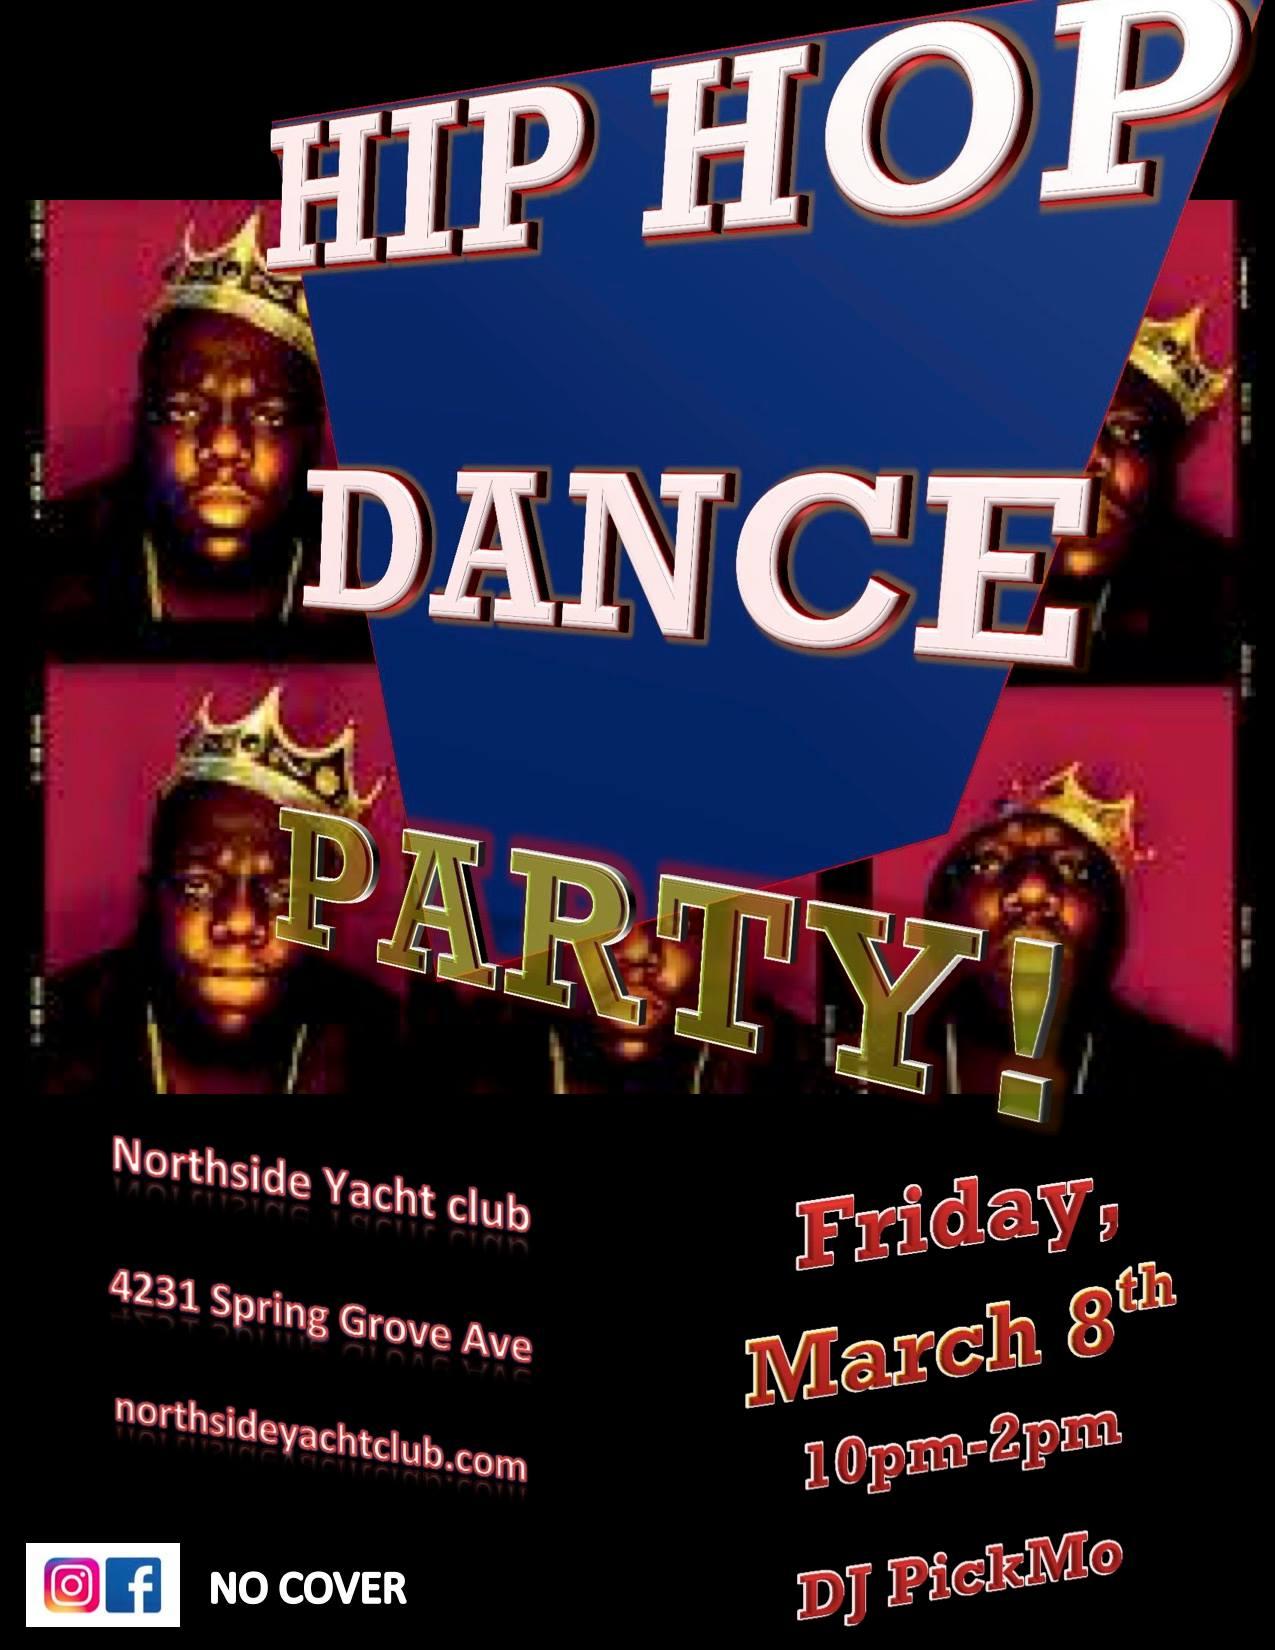 HIP HOP DANCE Party! – Northside Yacht Club